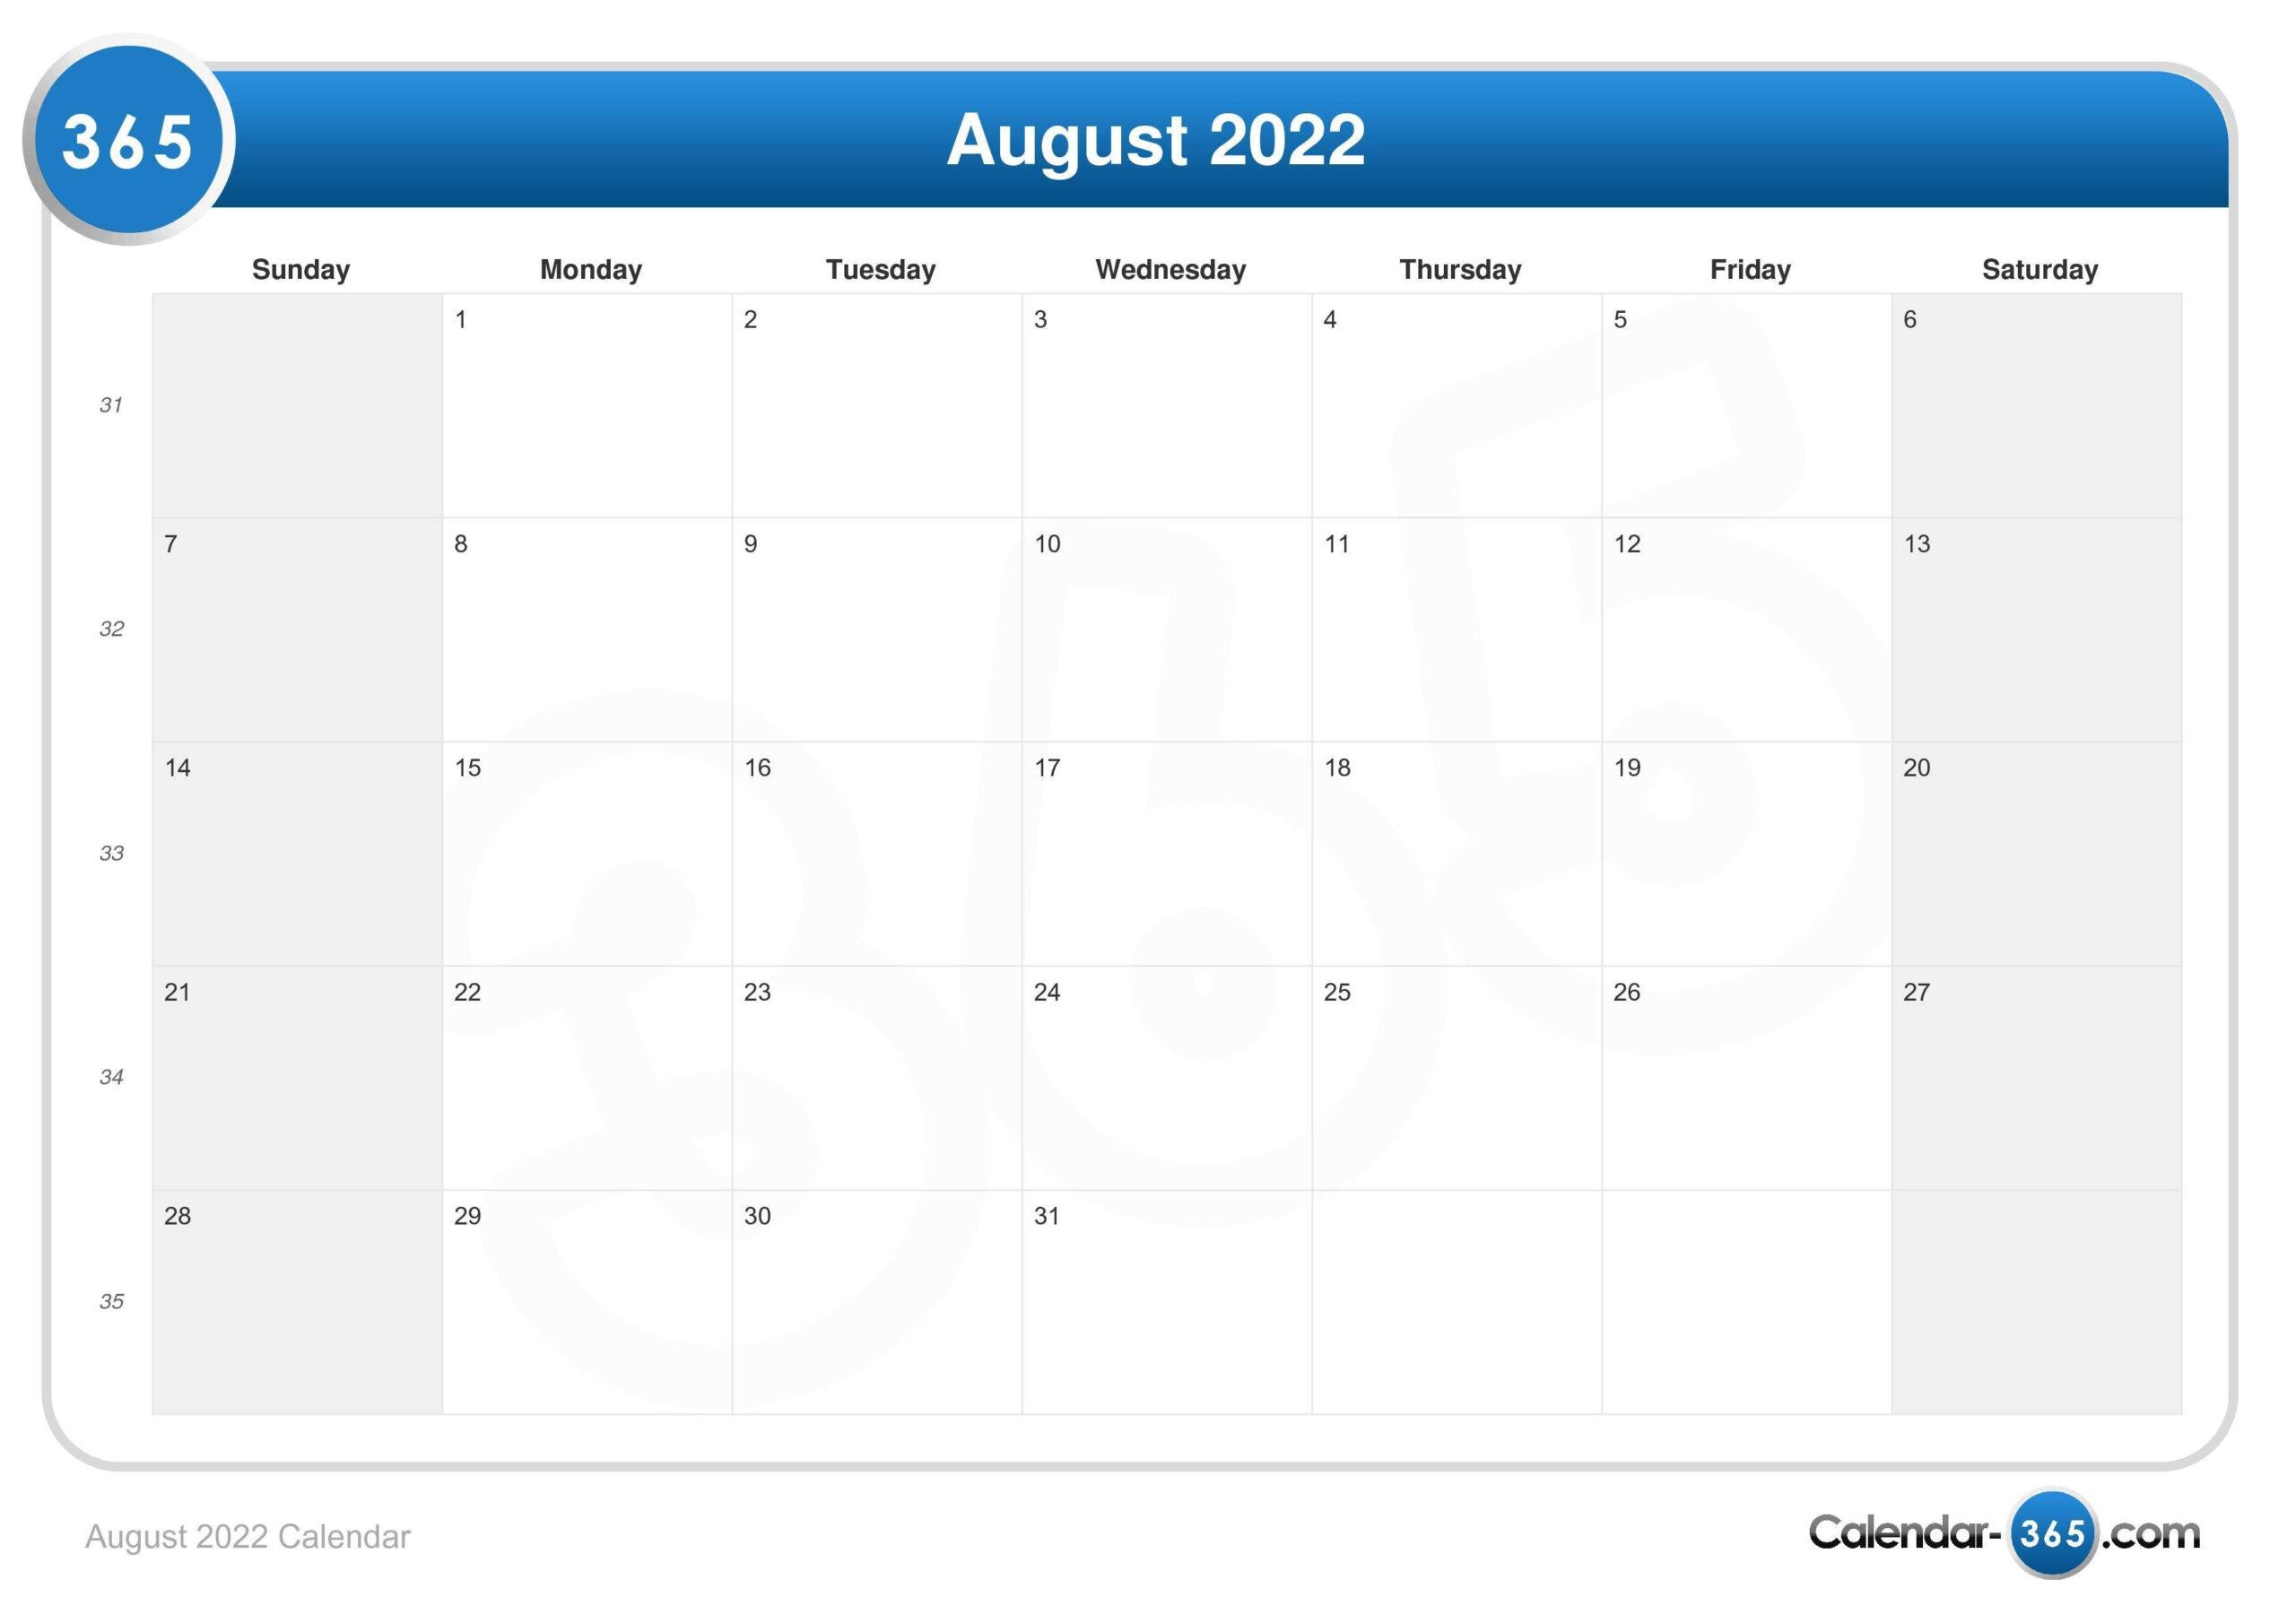 August 2022 Calendar regarding Free Printable Calendar August 2022 Graphics